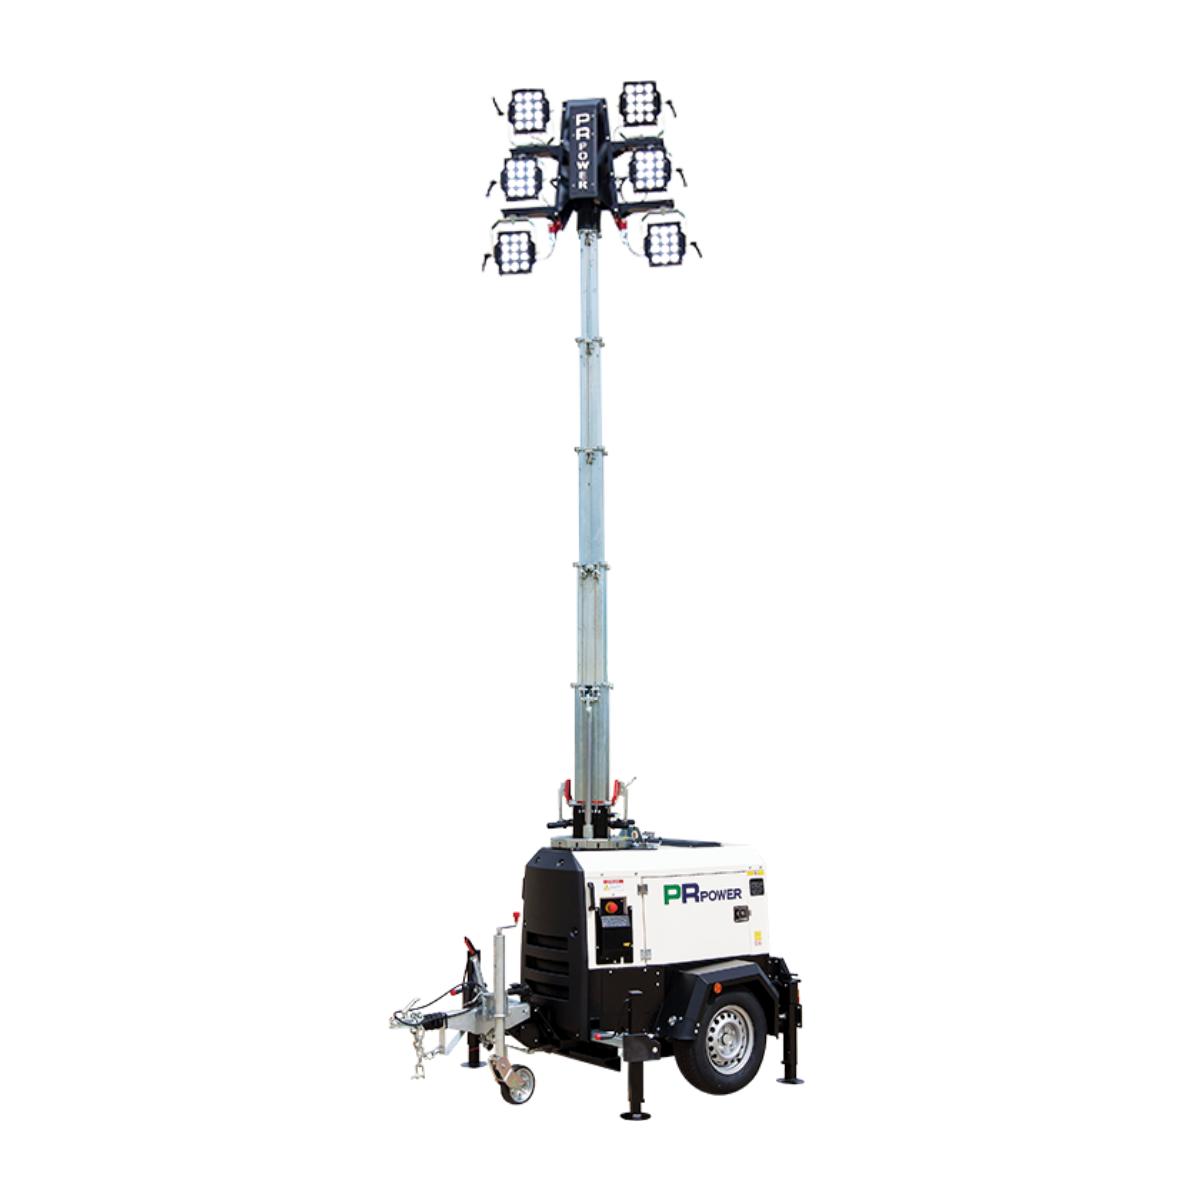 Complete Hire Equipment Pty Ltd